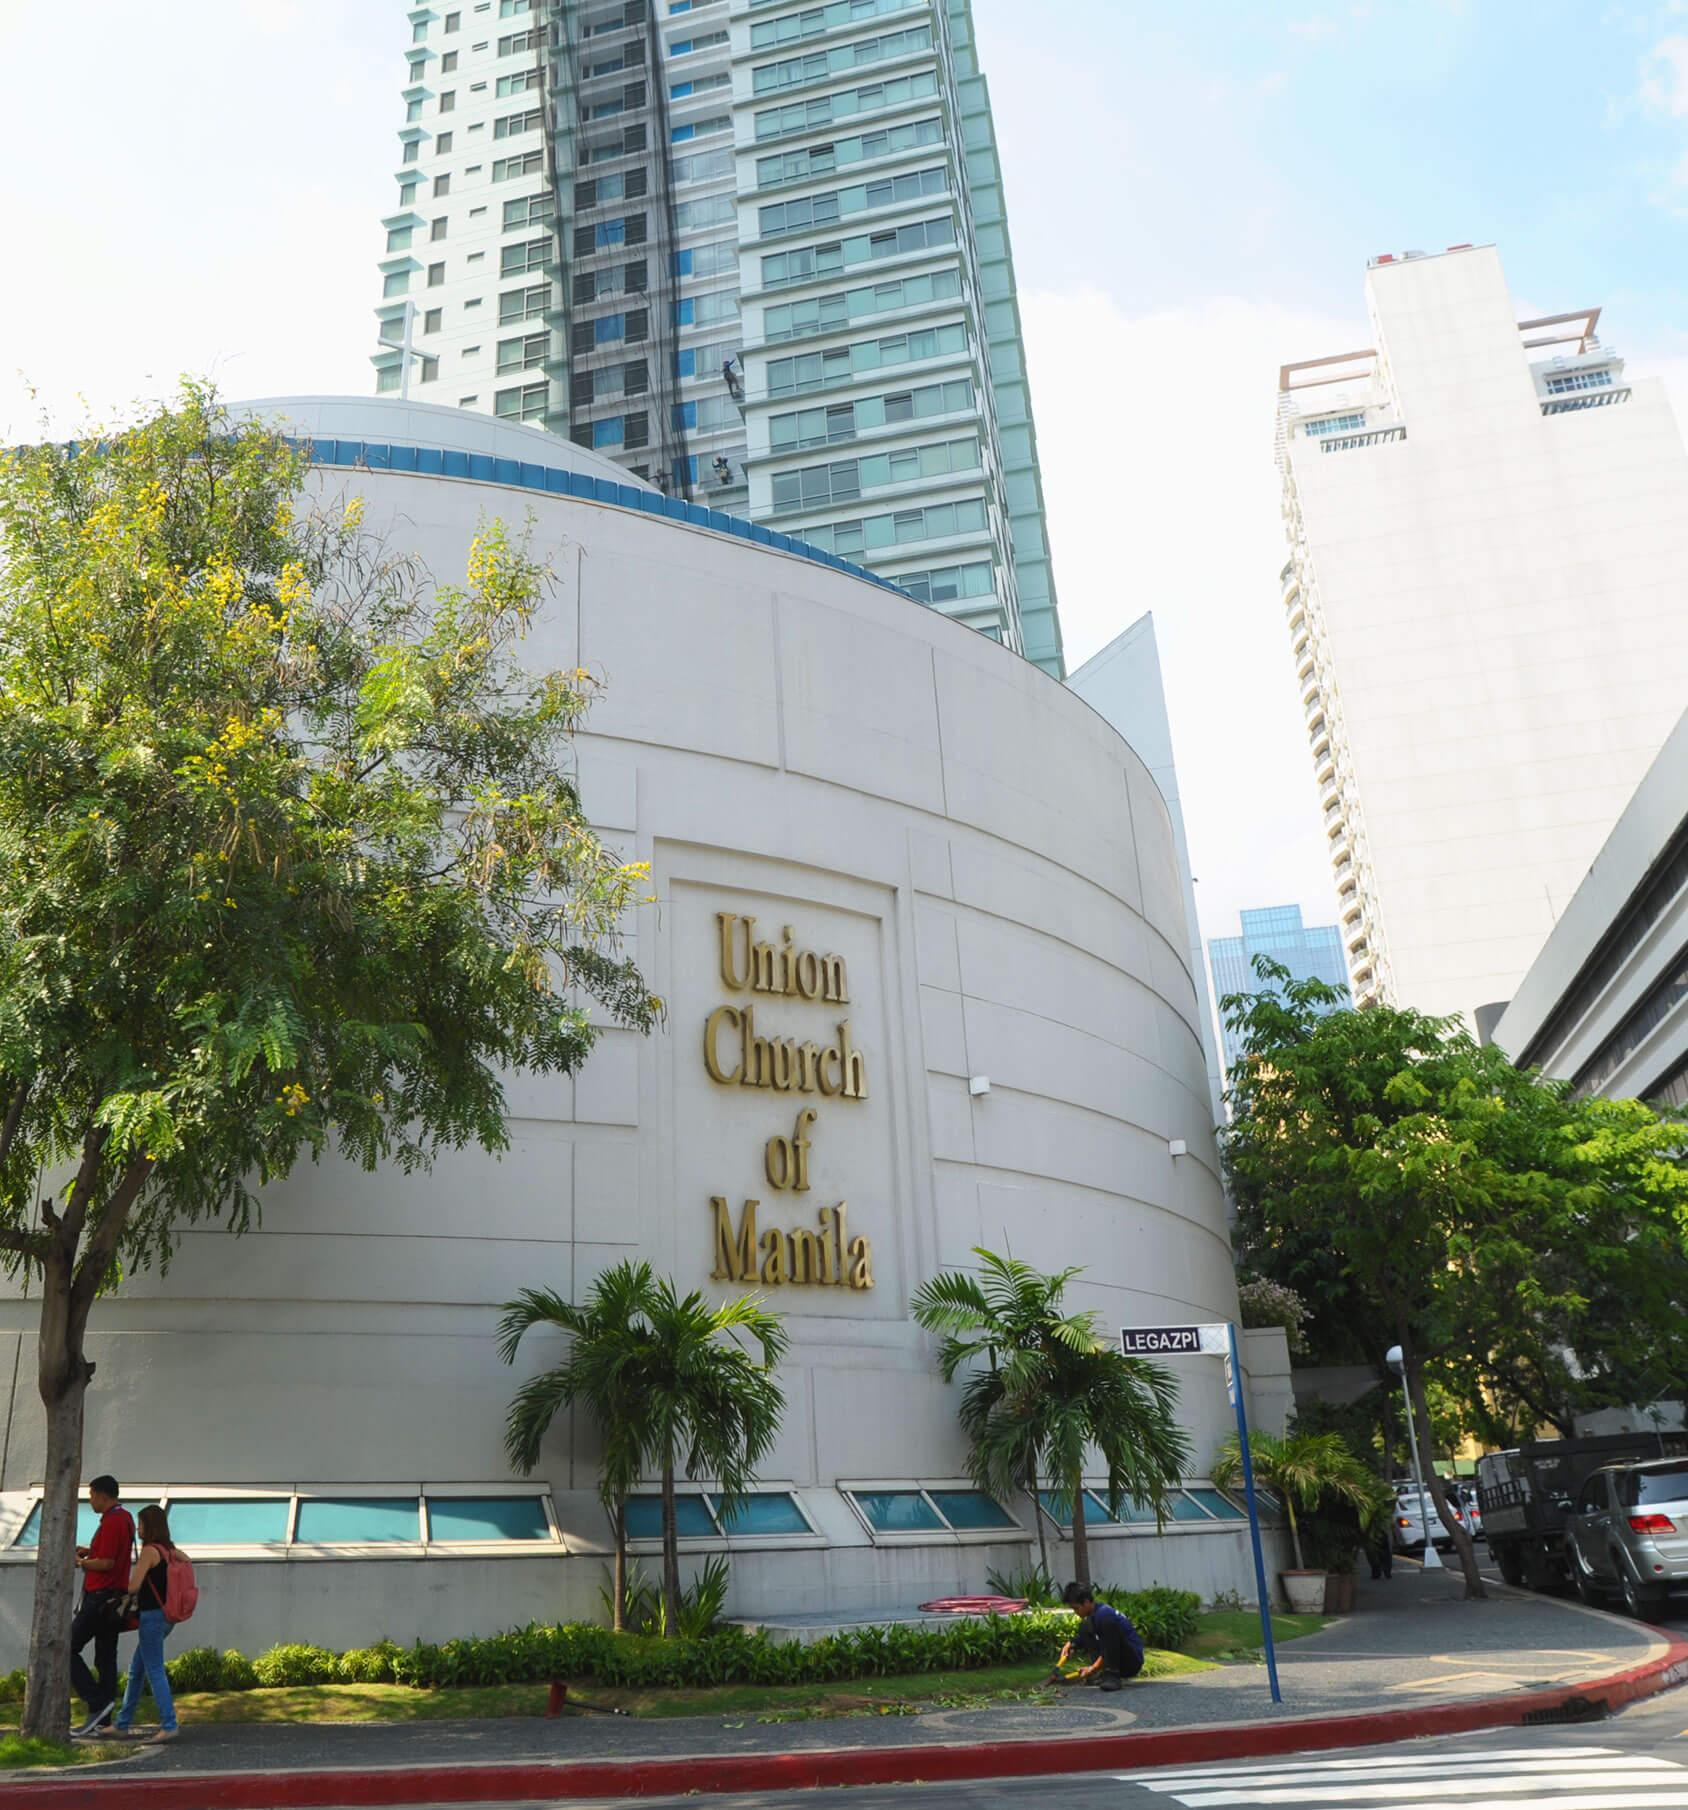 Union Church of Manila